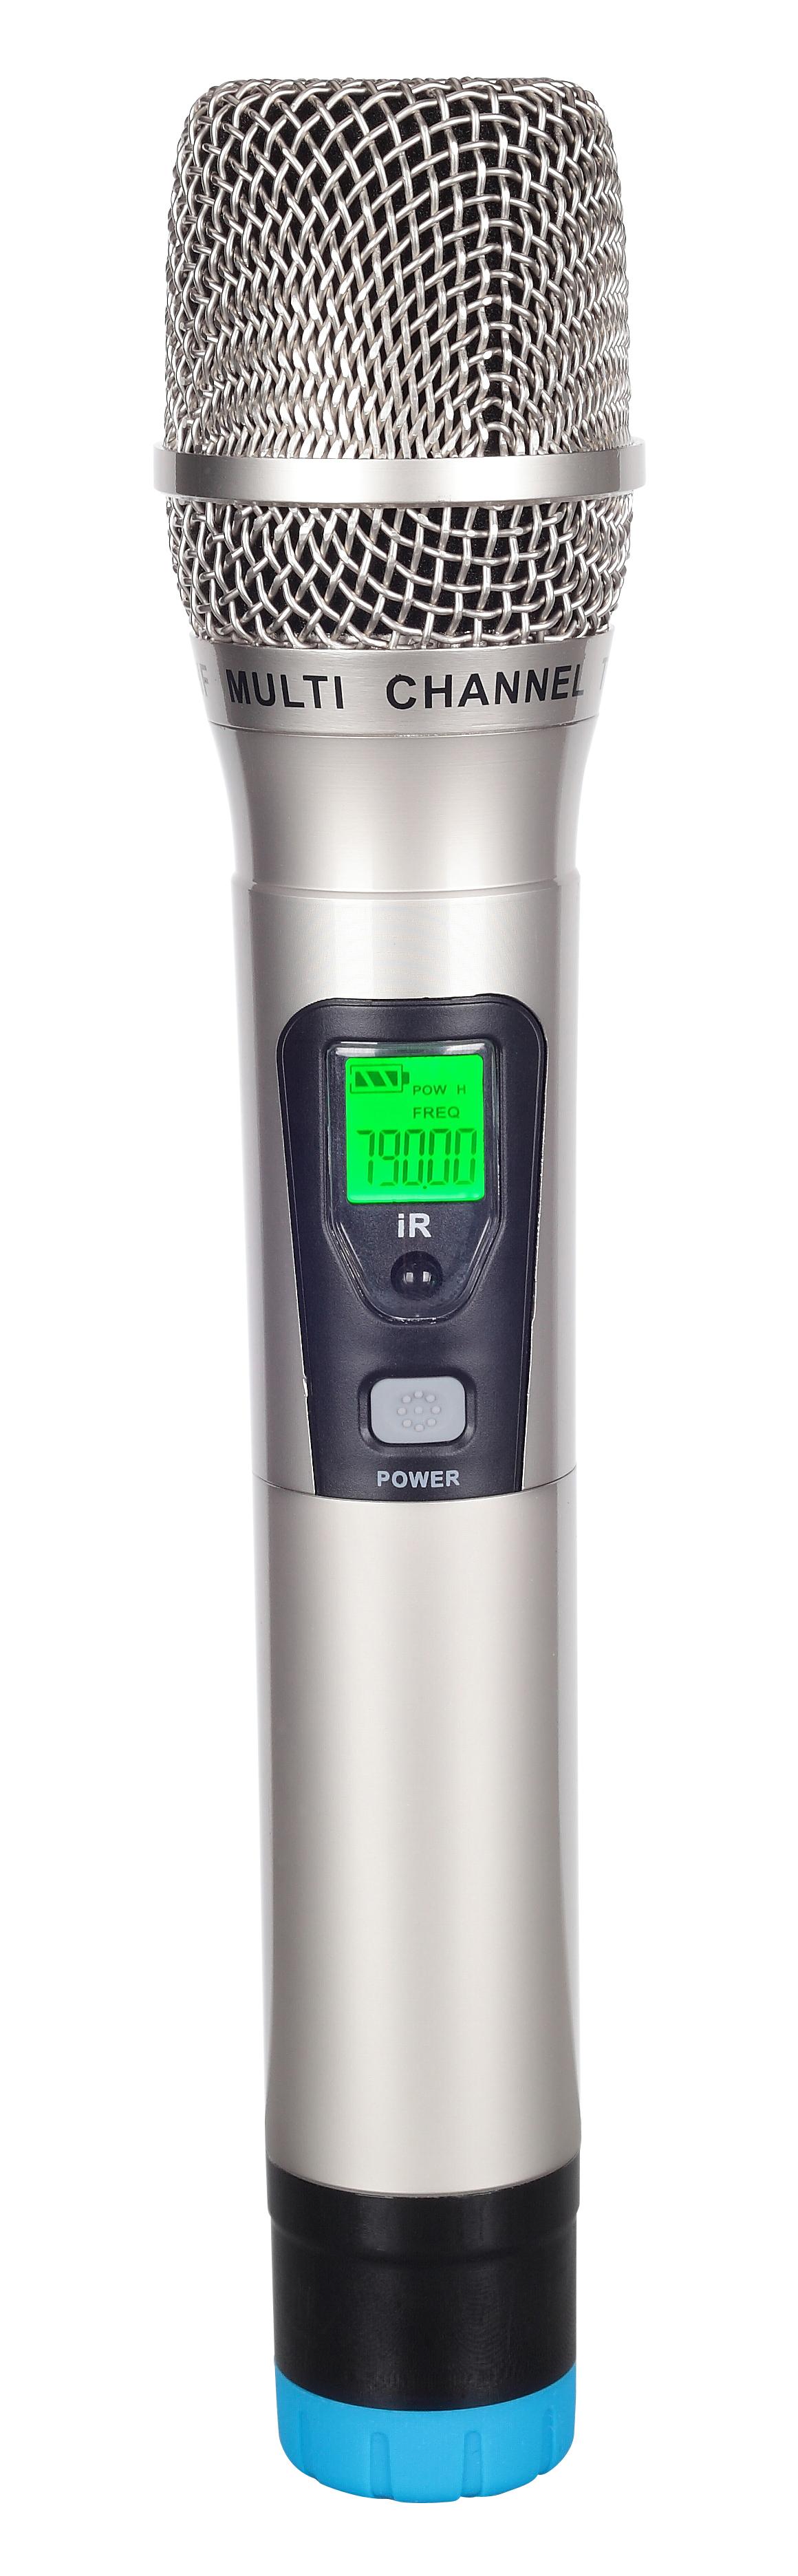 DSP-8200手持灰镍